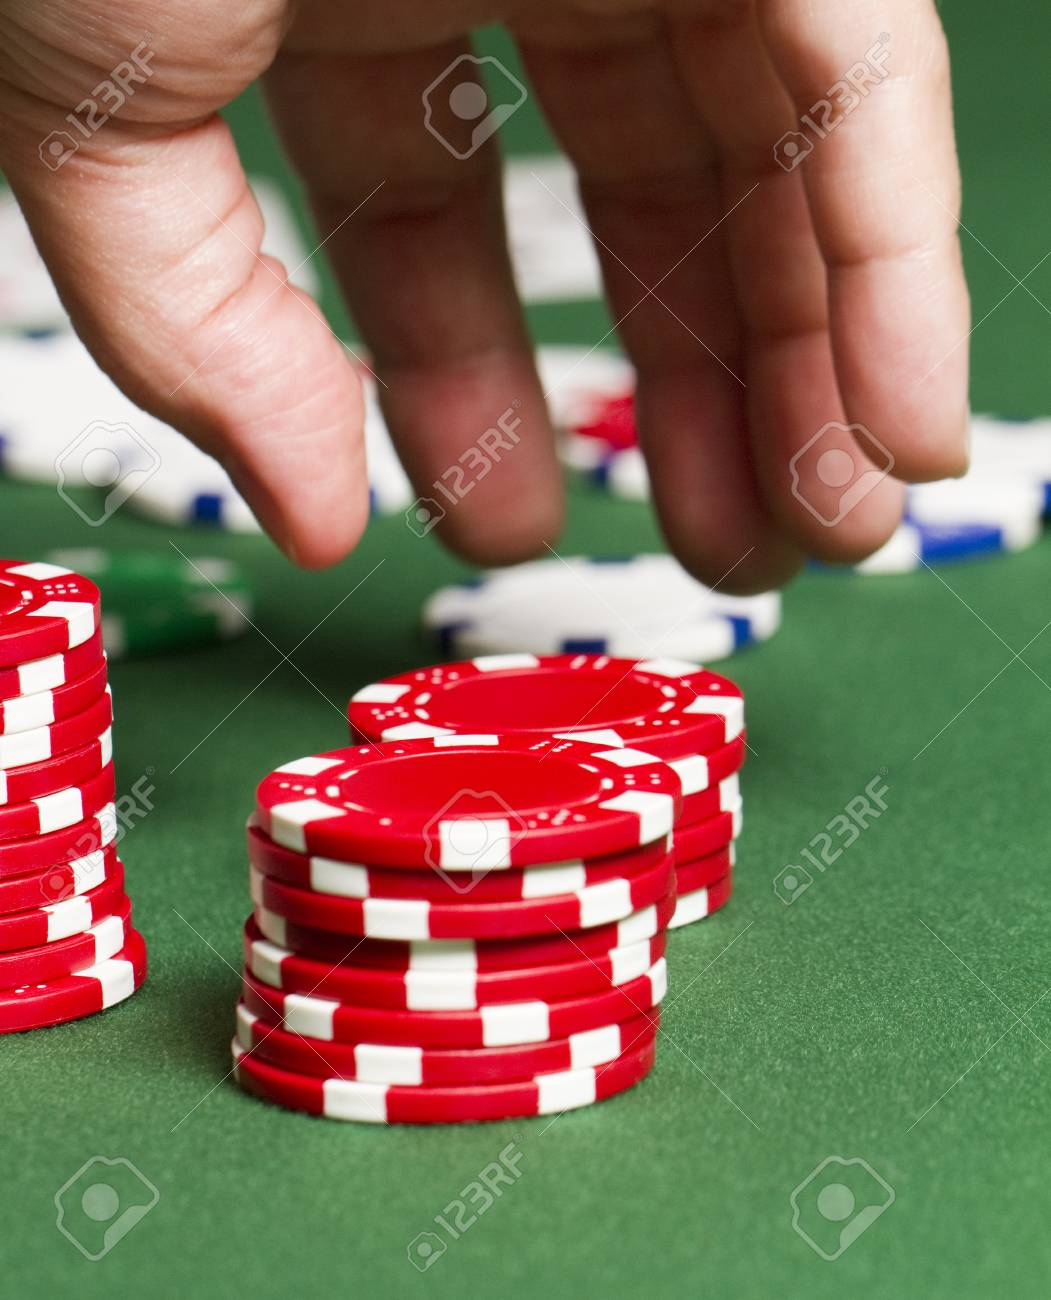 Emperors casino kempton park